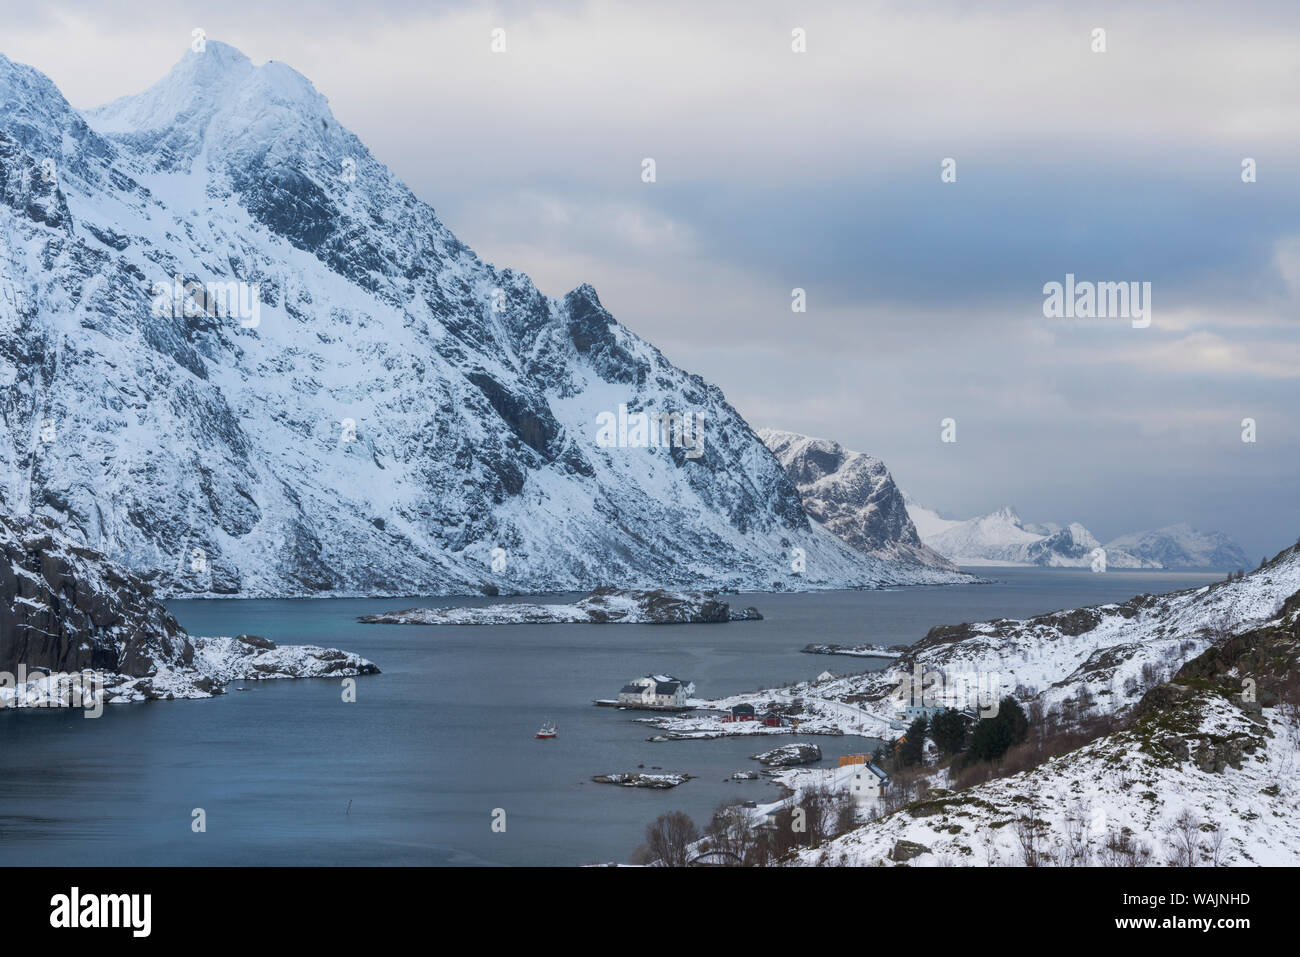 Norway, Lofoten Islands, Vestvag Island, Unstad. View of the rocky coastline on the way to Unstad. Stock Photo